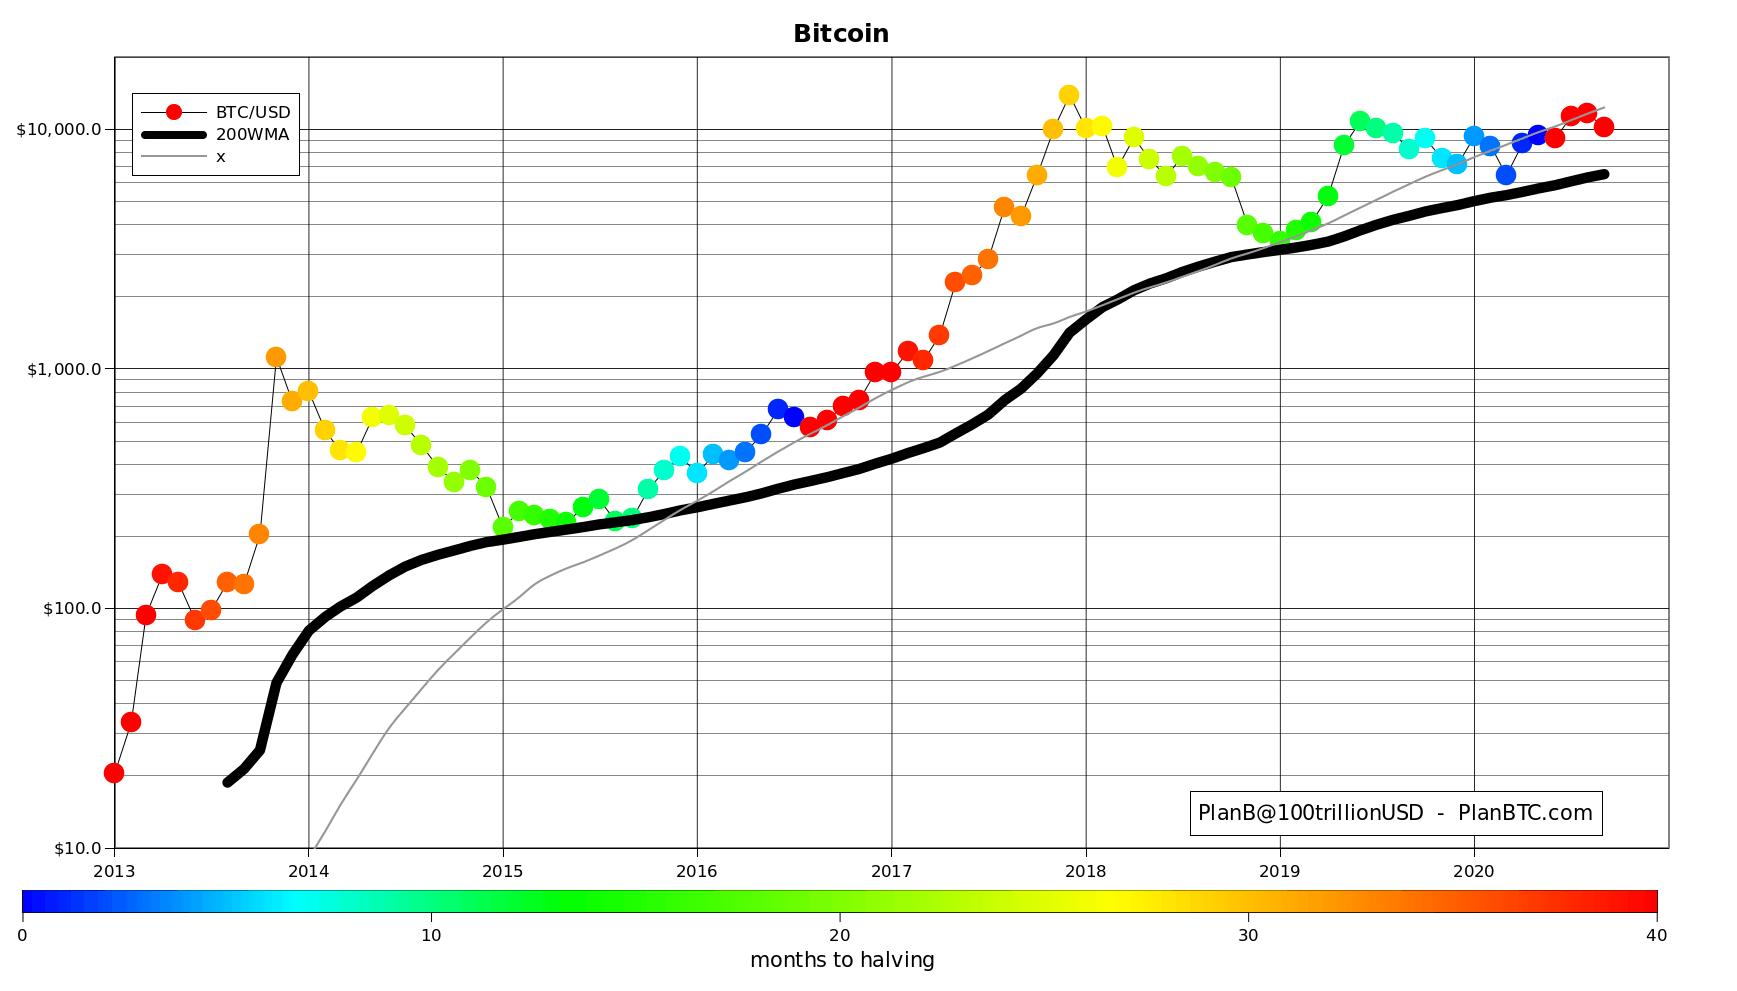 BTC S2F model